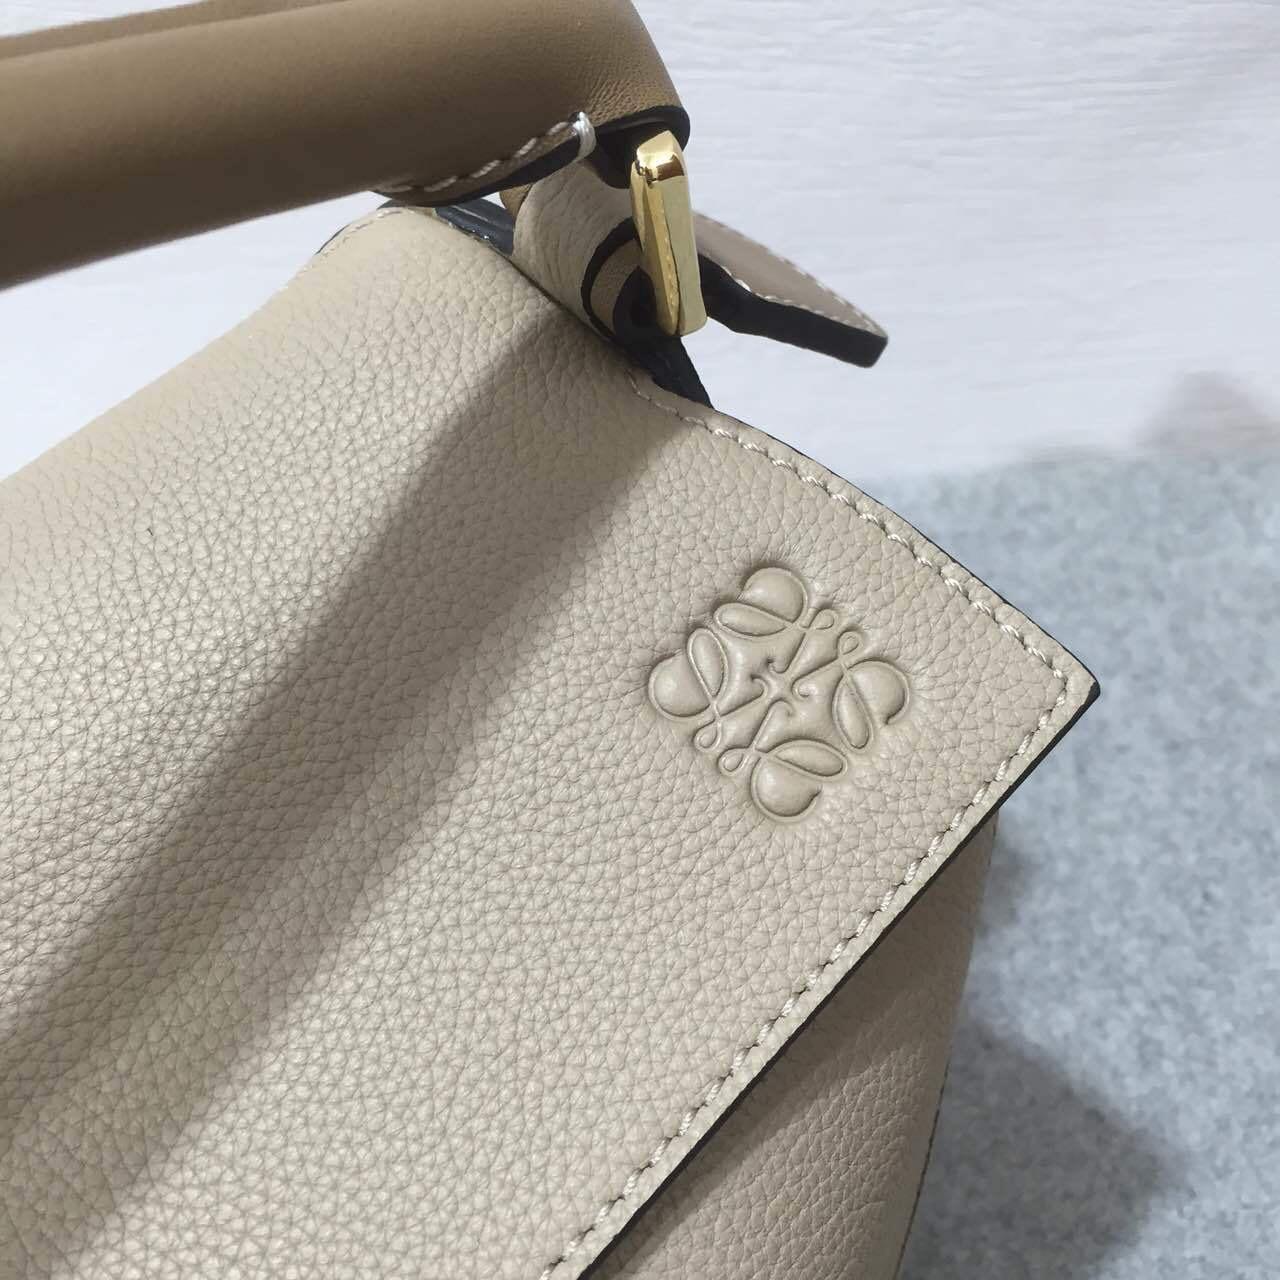 Loewe羅意威小號幾何包 Puzzle Small Bag Sand/Mink Colour 顆粒小牛皮